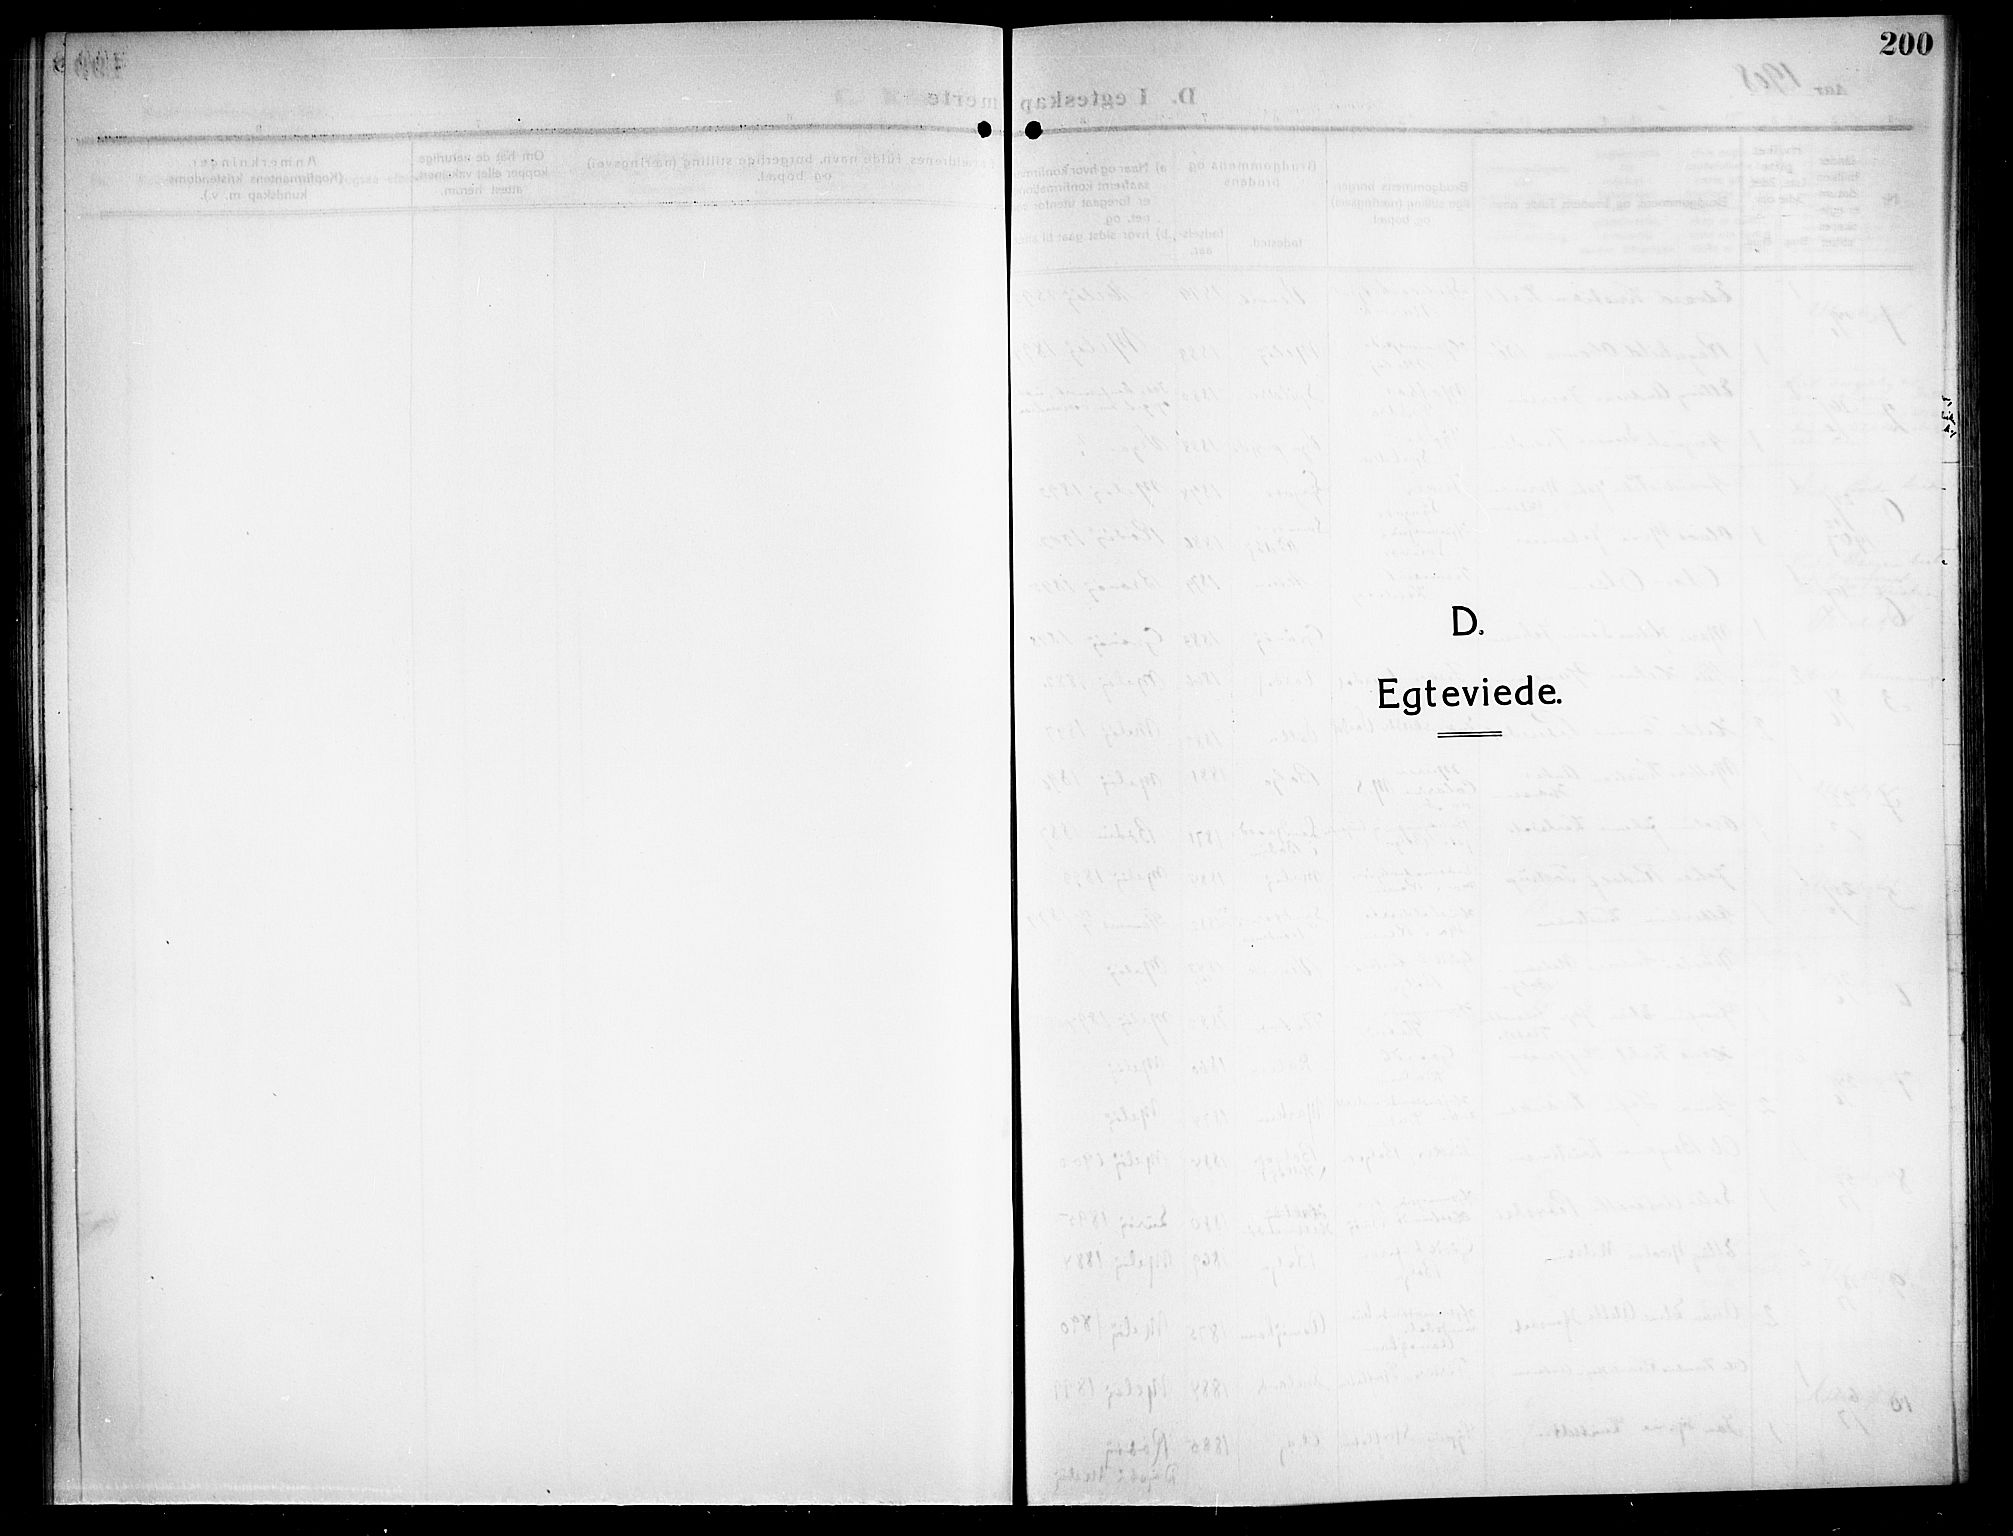 SAT, Ministerialprotokoller, klokkerbøker og fødselsregistre - Nordland, 843/L0639: Klokkerbok nr. 843C08, 1908-1924, s. 200